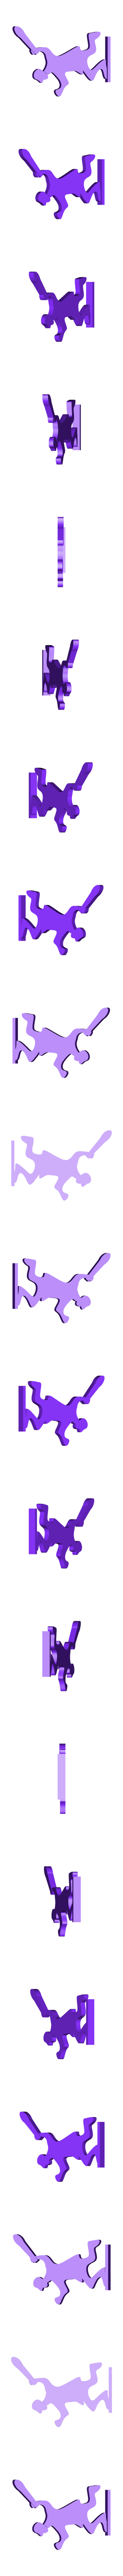 hunter_club1.stl Download free STL file Palaeo Flats • 3D printing template, Earsling